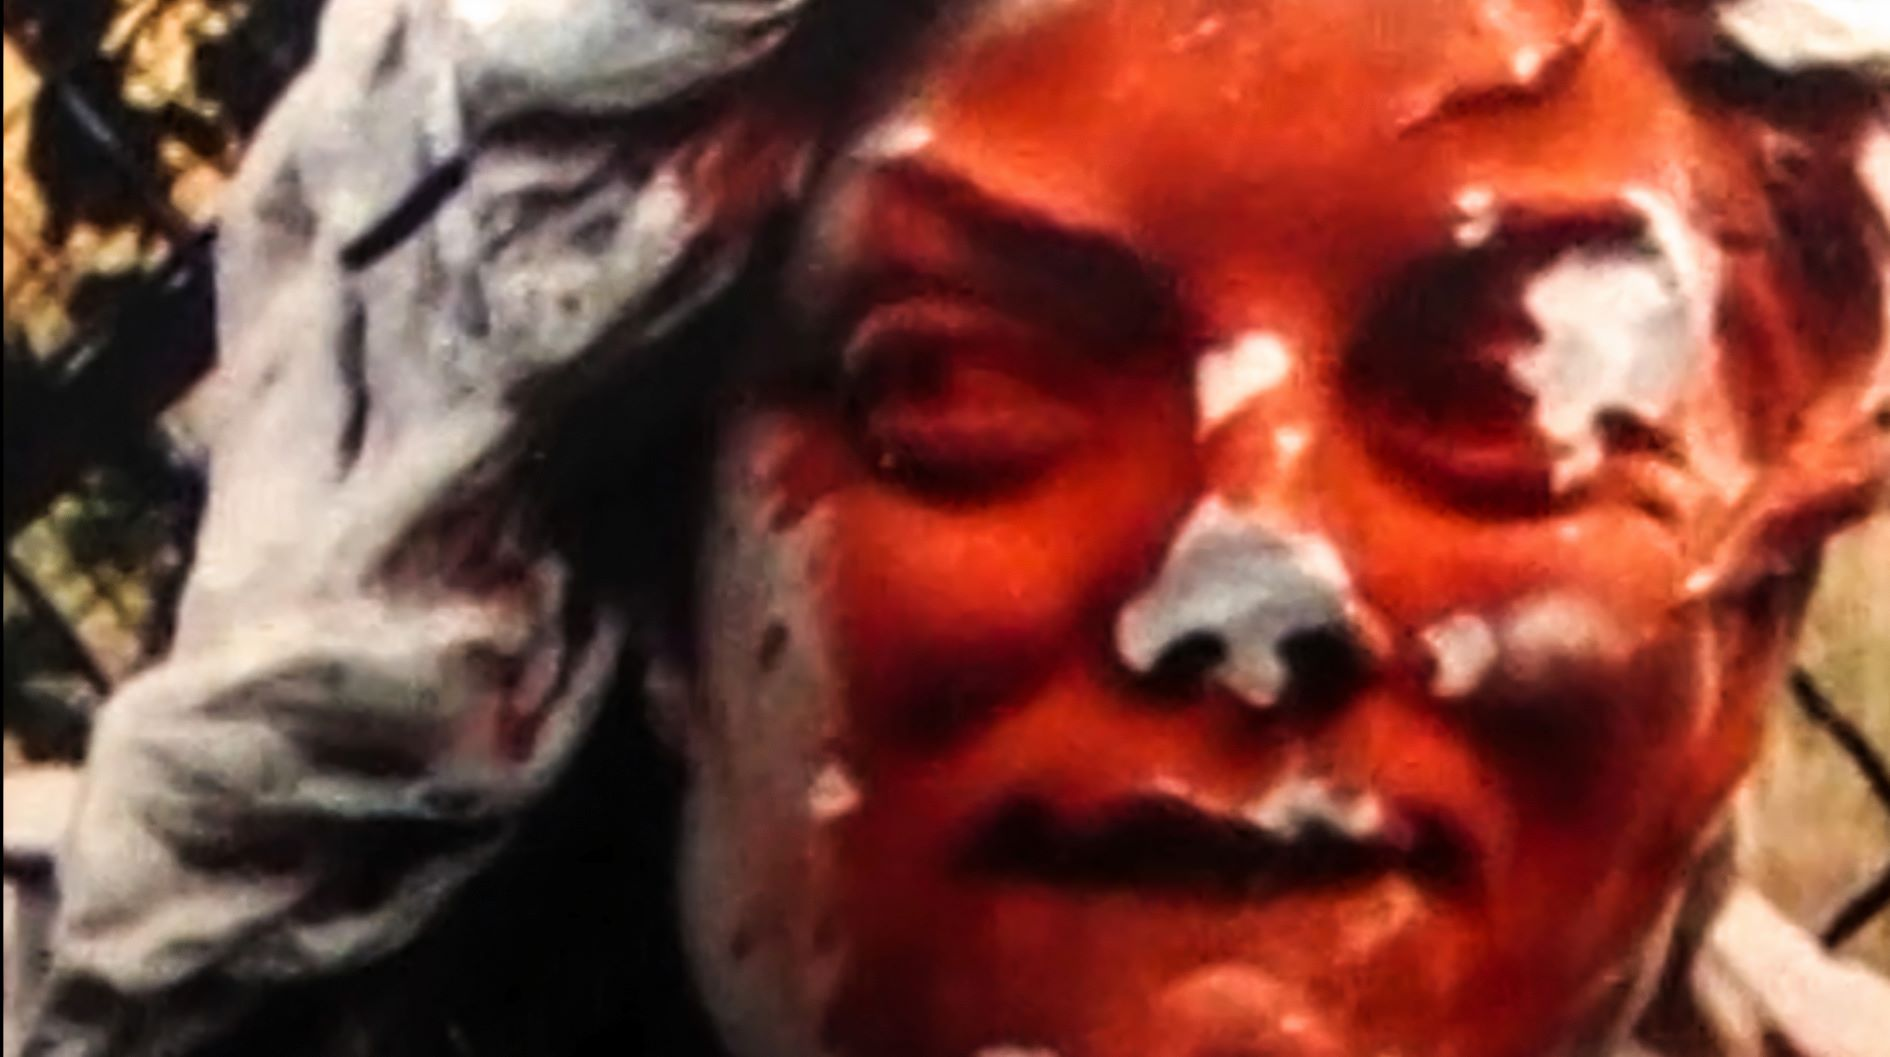 Anka Leśniak, The Restoration of the Witch, part 1, 2019-20, video still